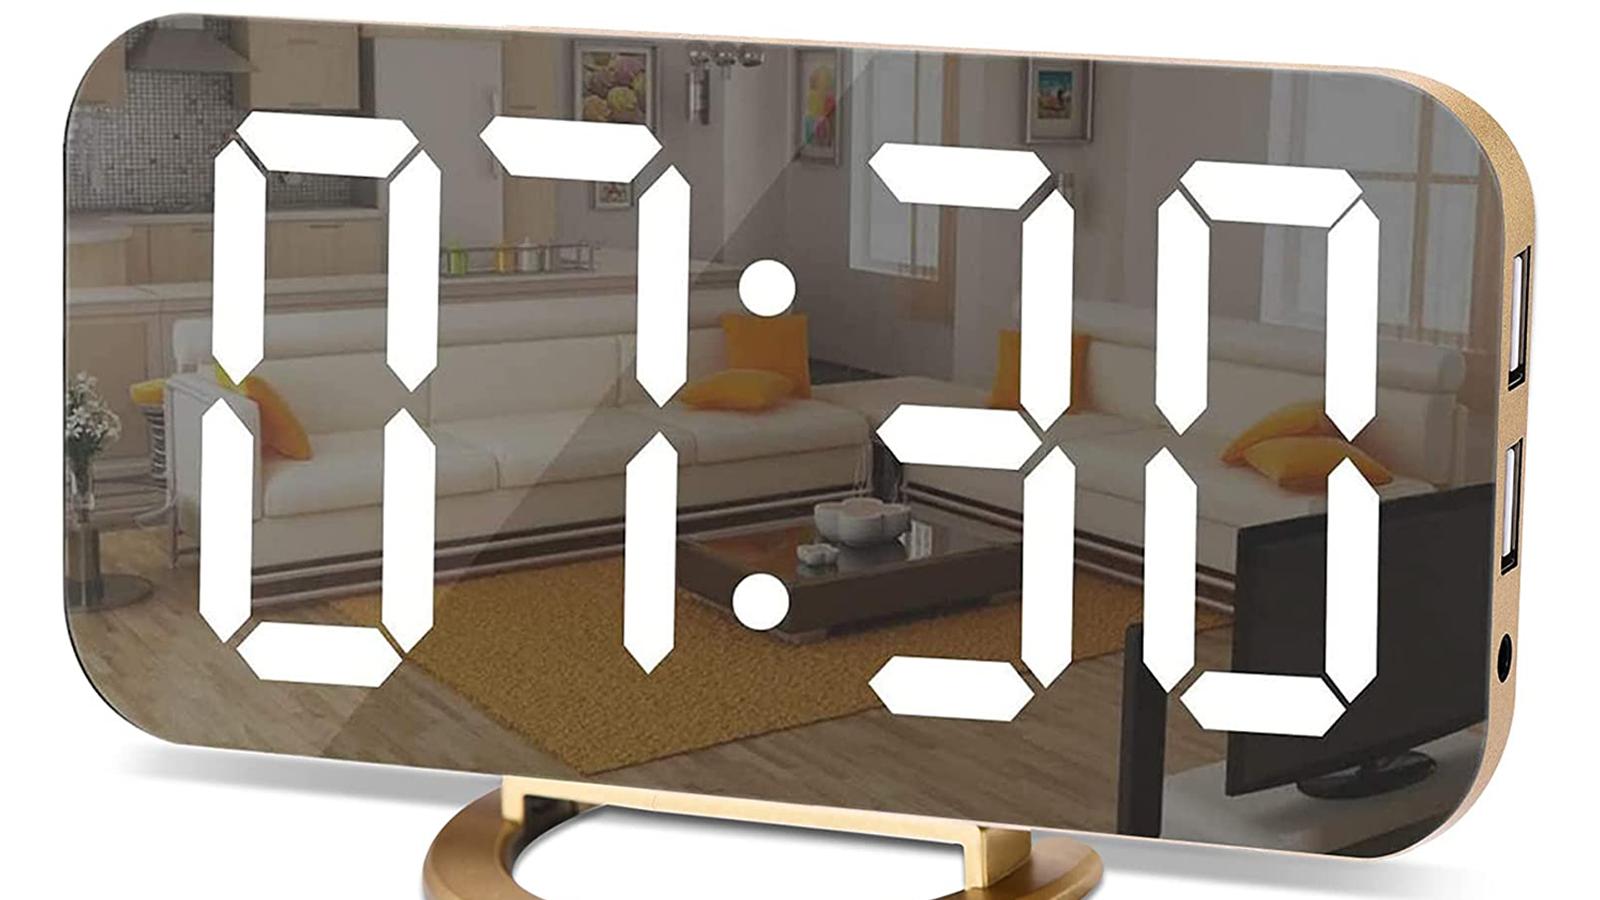 This Funky Digital Alarm Clock Has a Creative Mirror Design